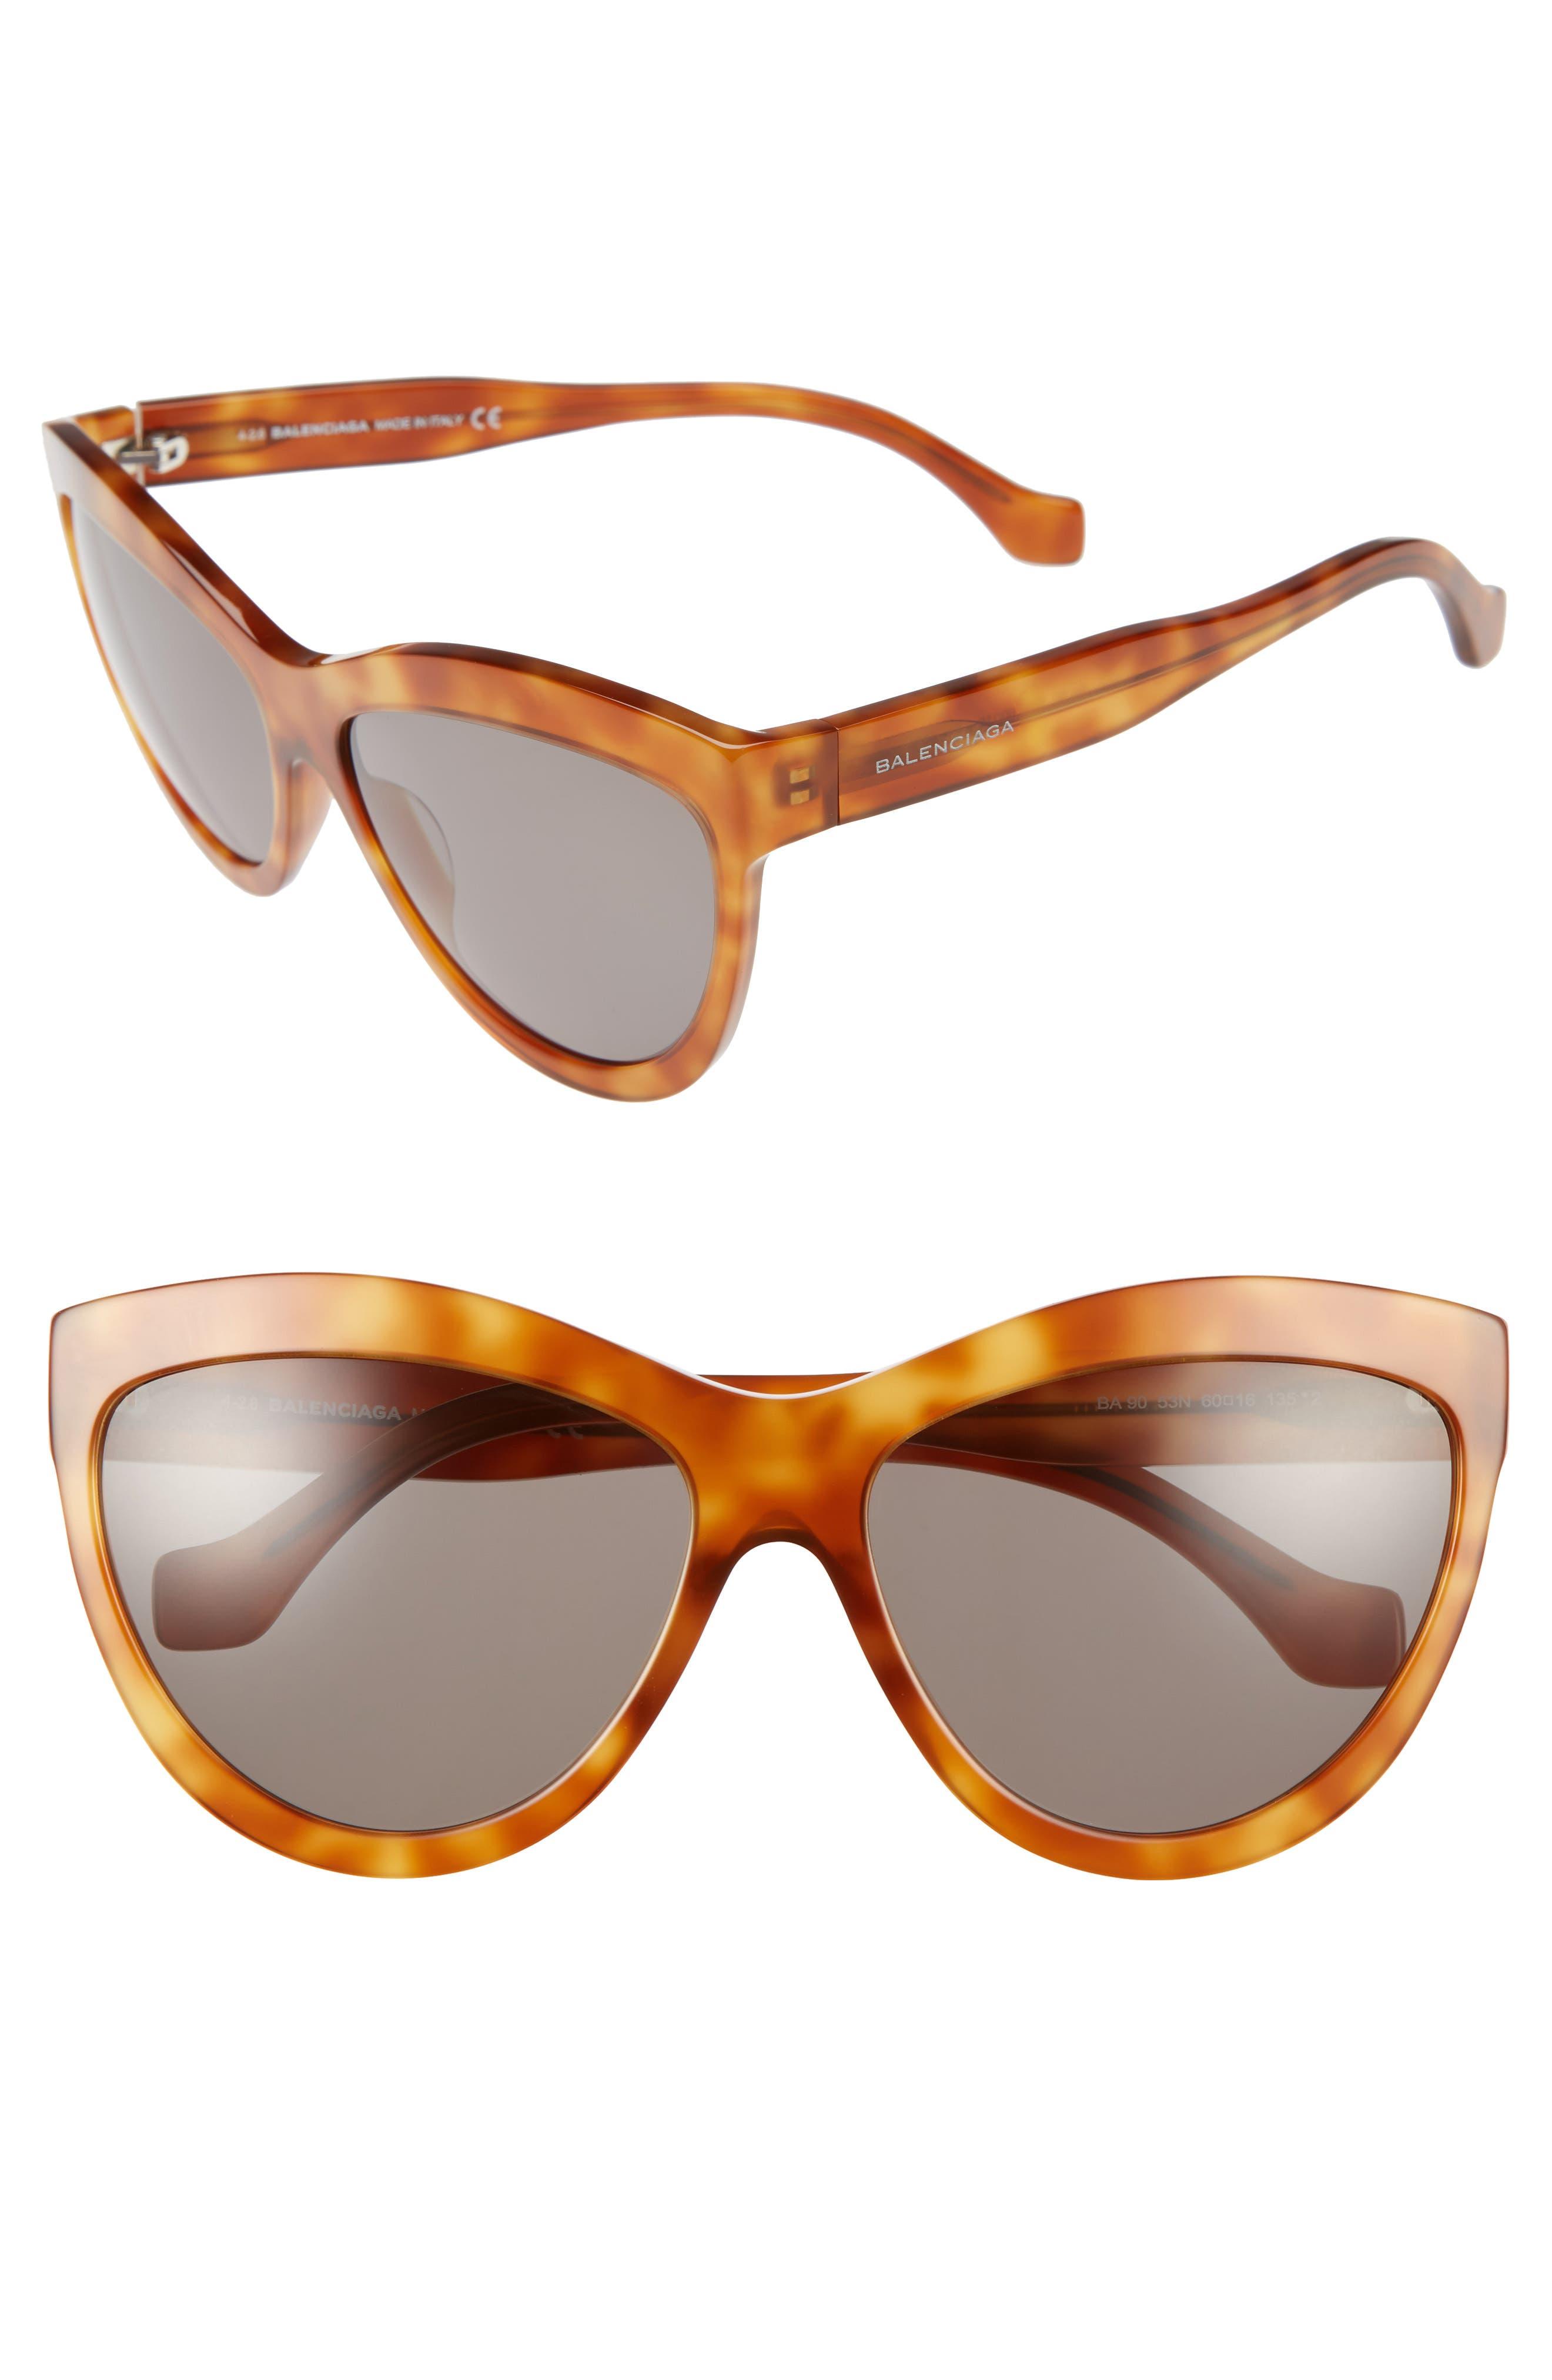 60mm Sunglasses,                         Main,                         color, LIGHT HAVANA/ SILVER/ GREEN